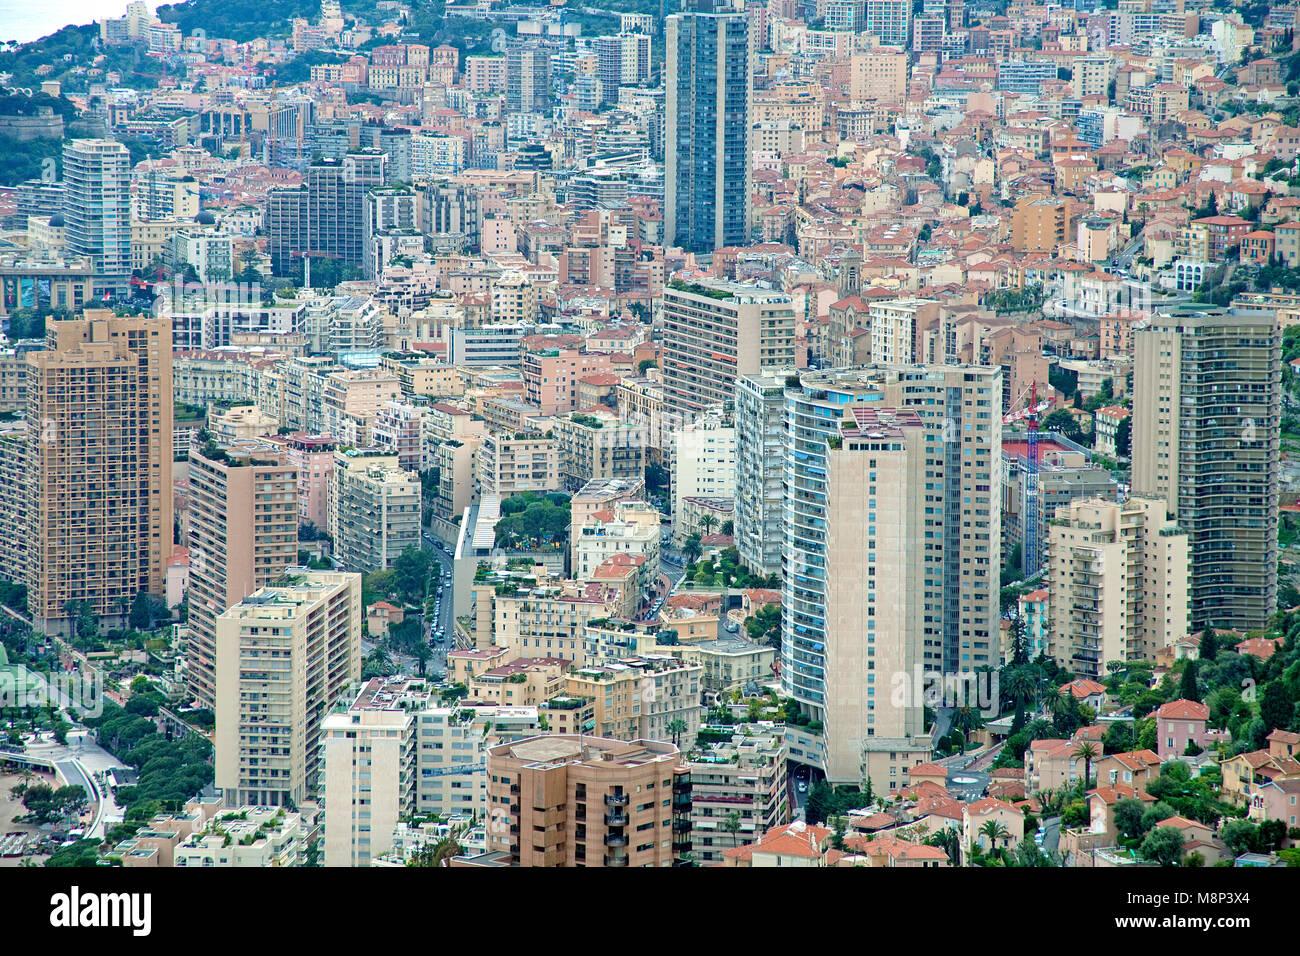 Mass of houses, view on the city of Monaco, negative space, Monaco-Ville, Principality of Monaco, Europa - Stock Image